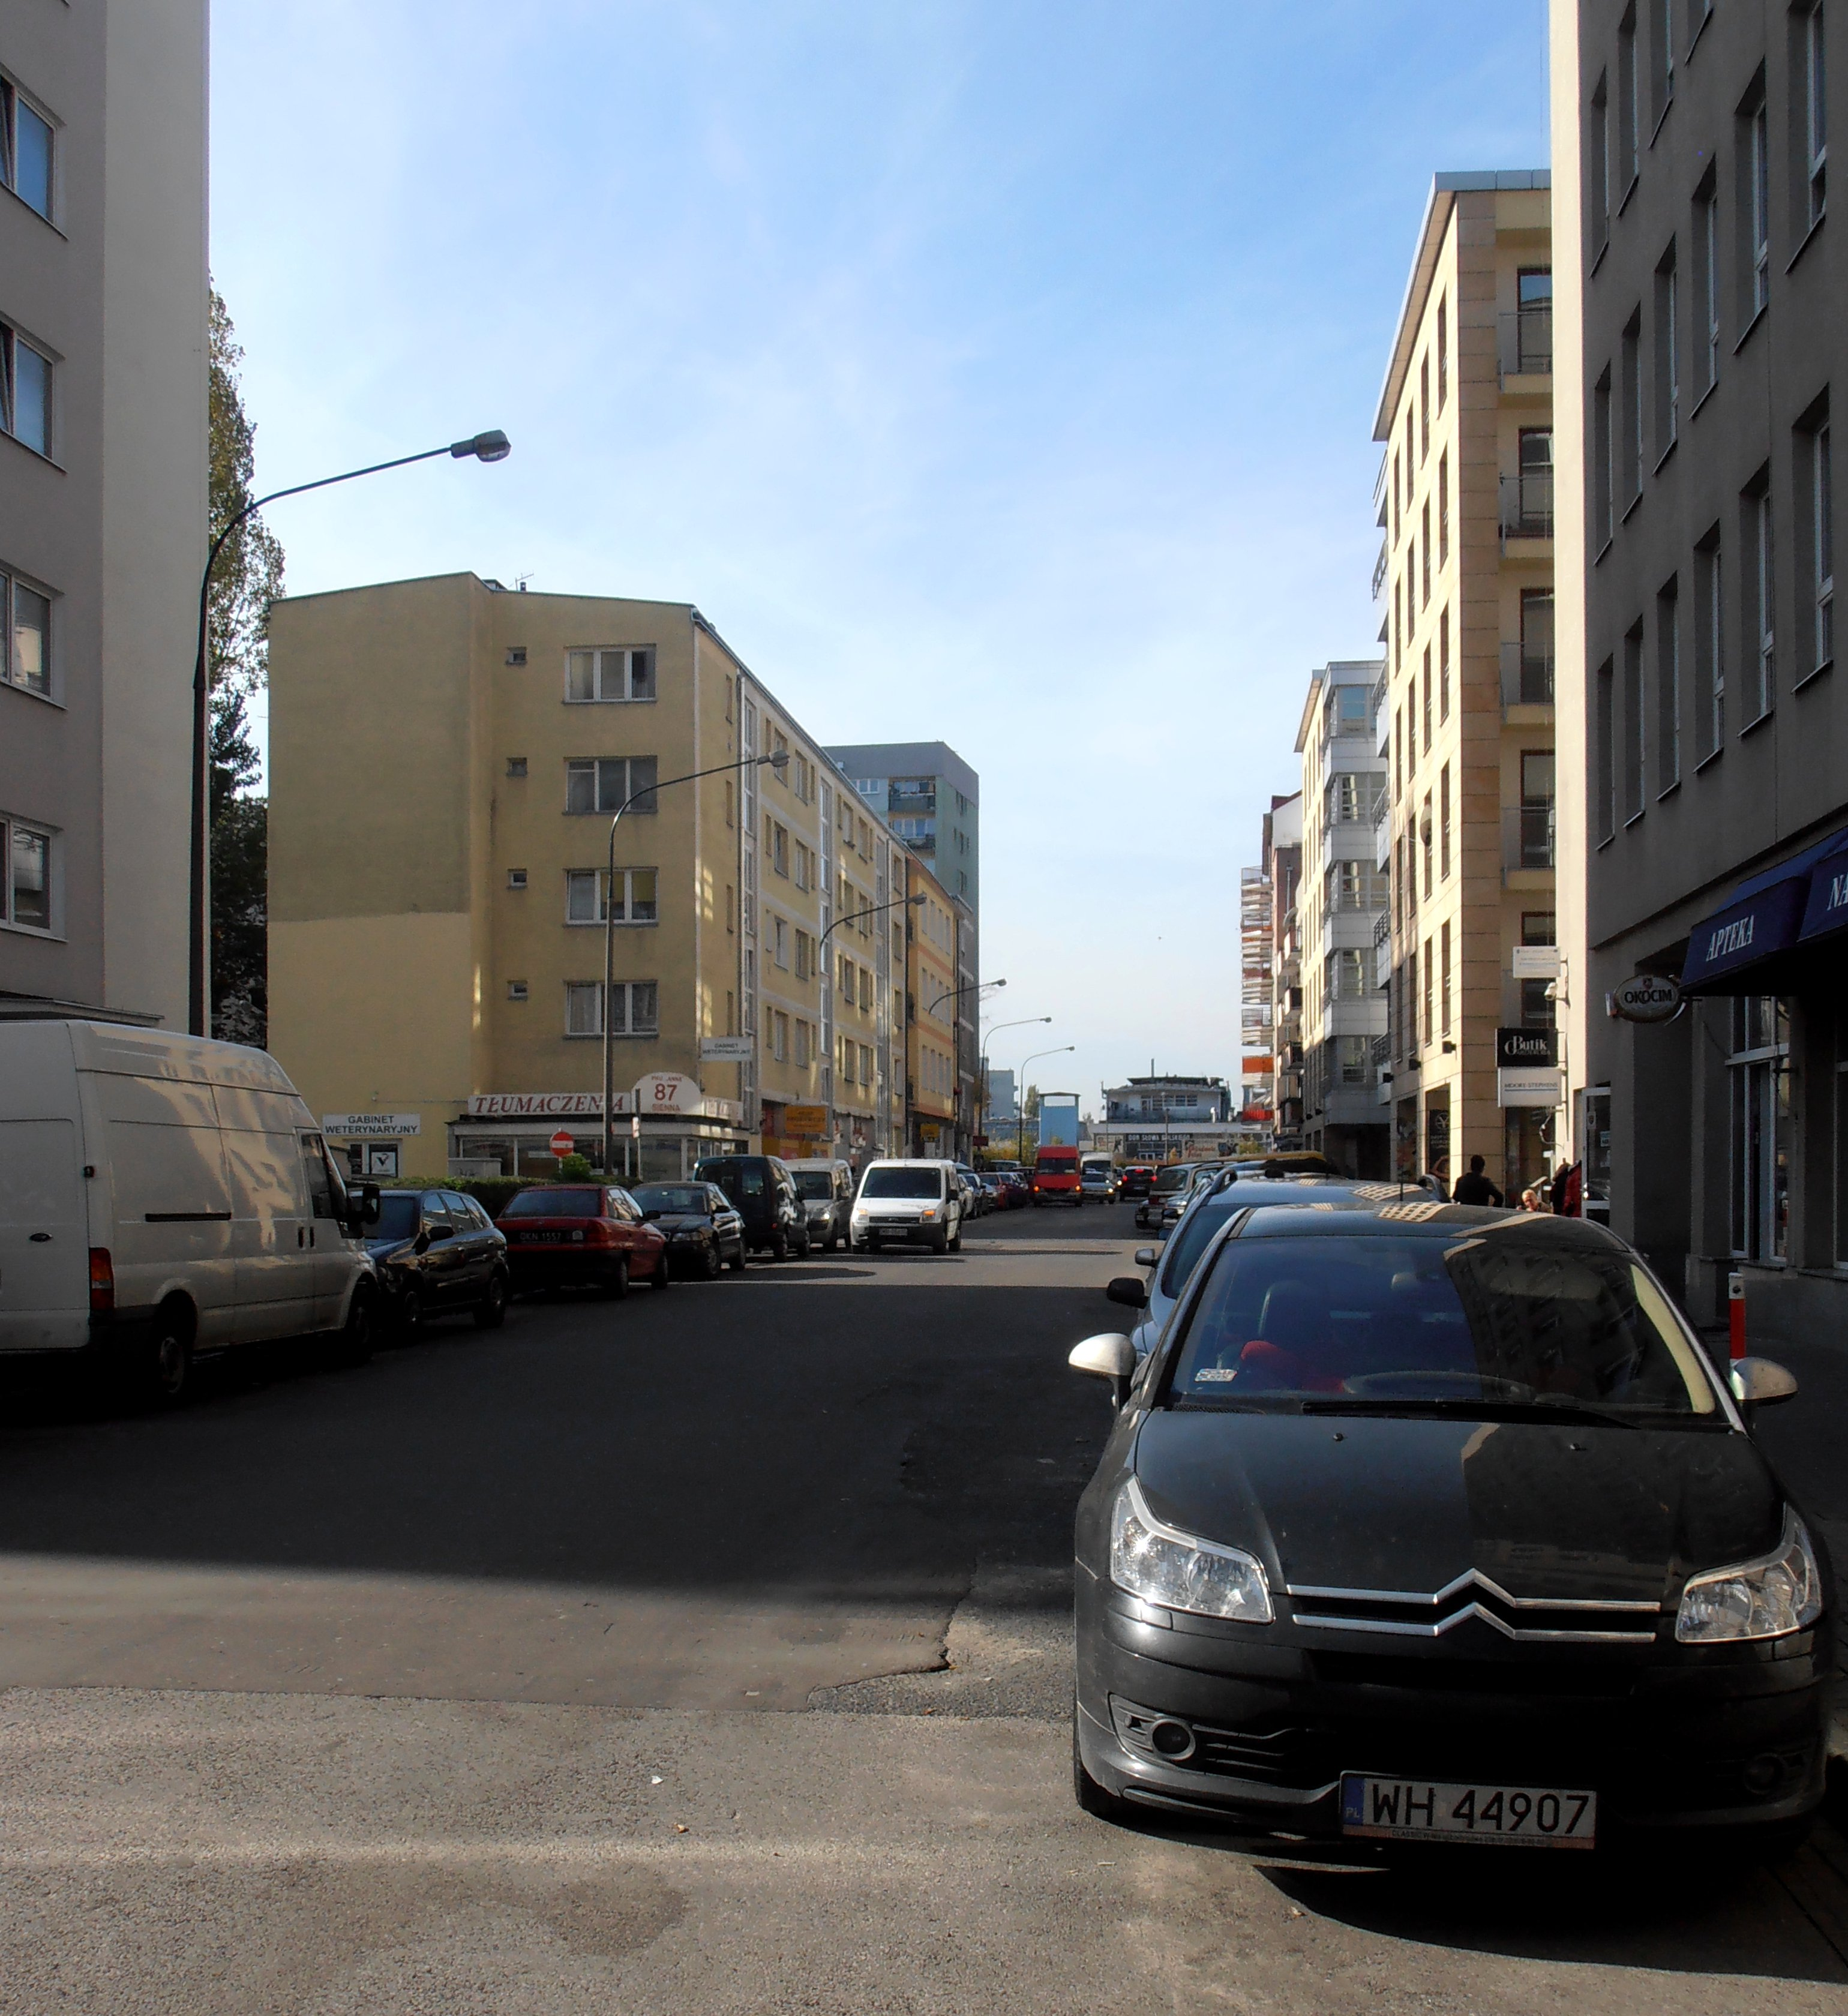 Ulica Sienna